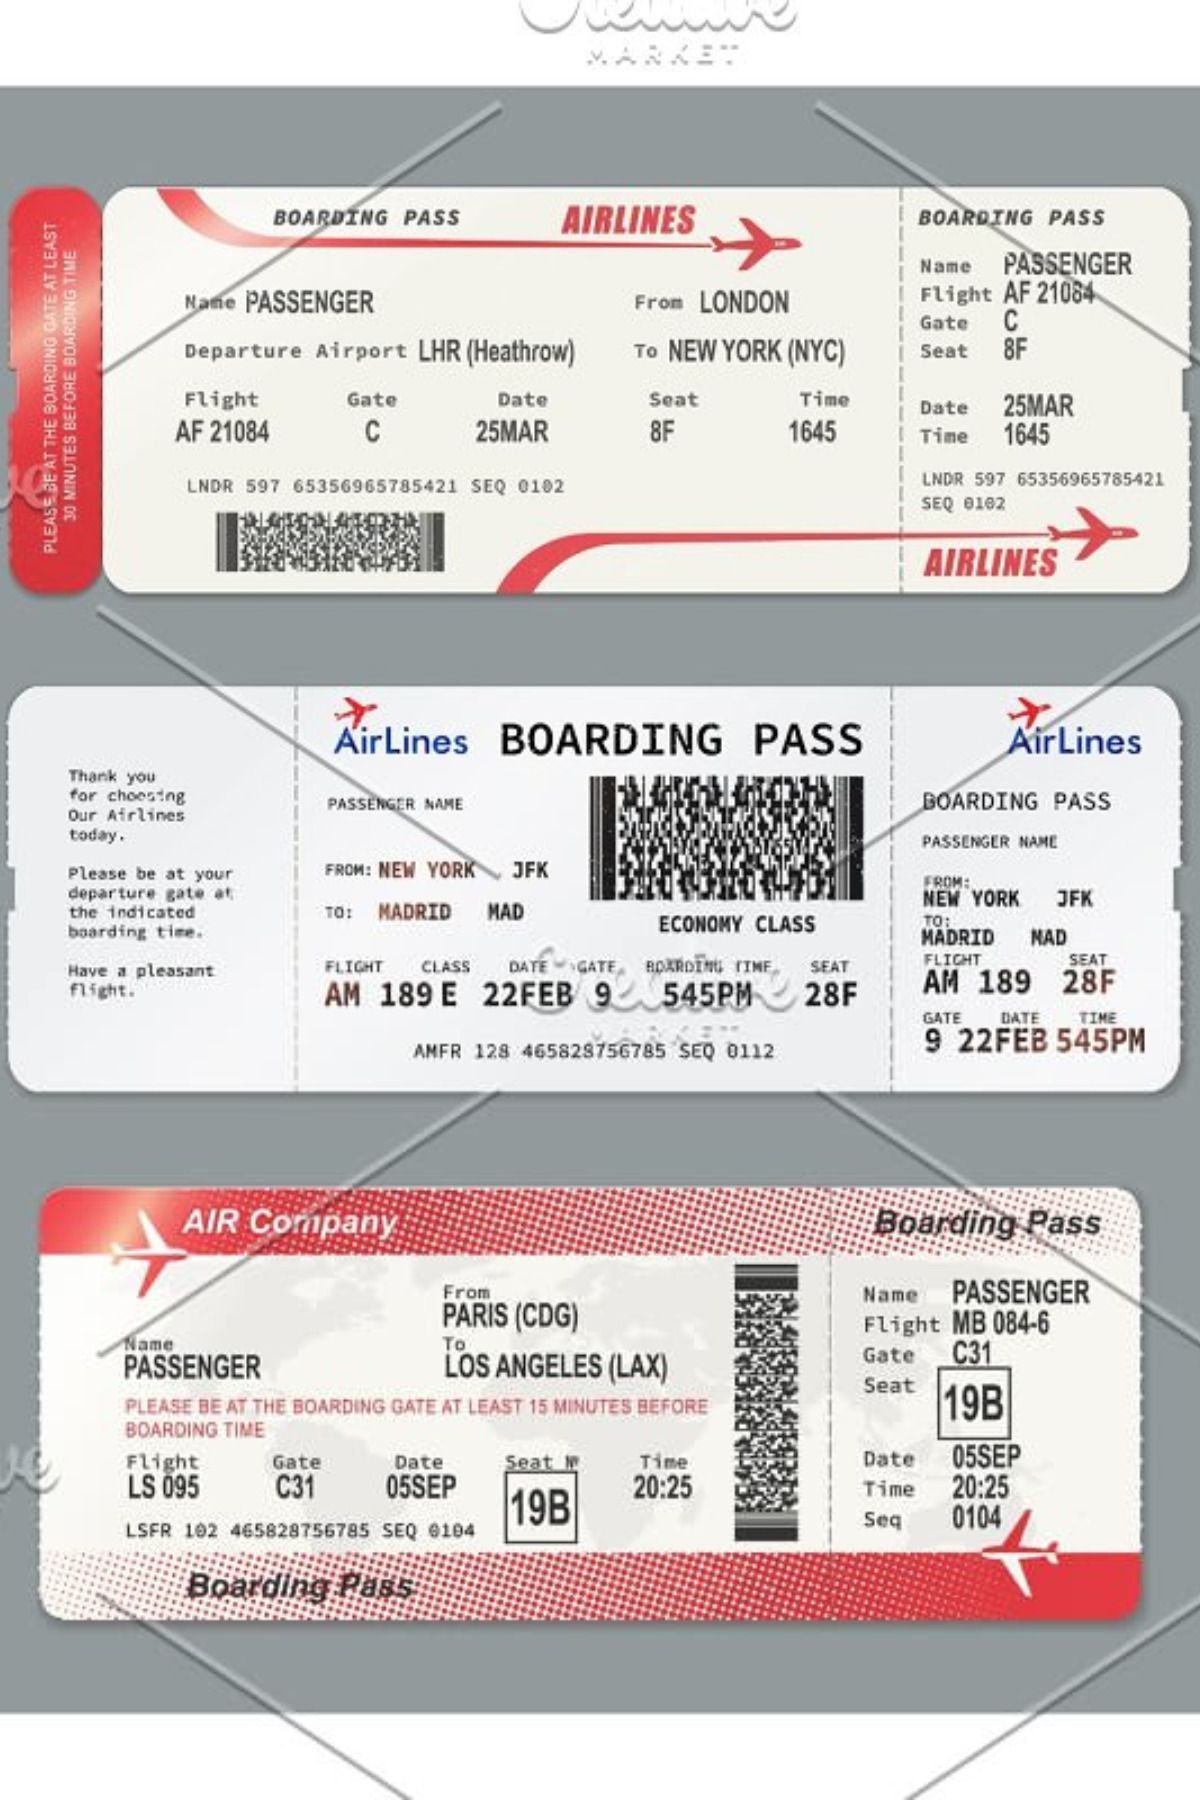 Fake Plane Ticket Generator : plane, ticket, generator, Plane, Ticket, Template, Boarding, Airline, Tickets,, Ticket,